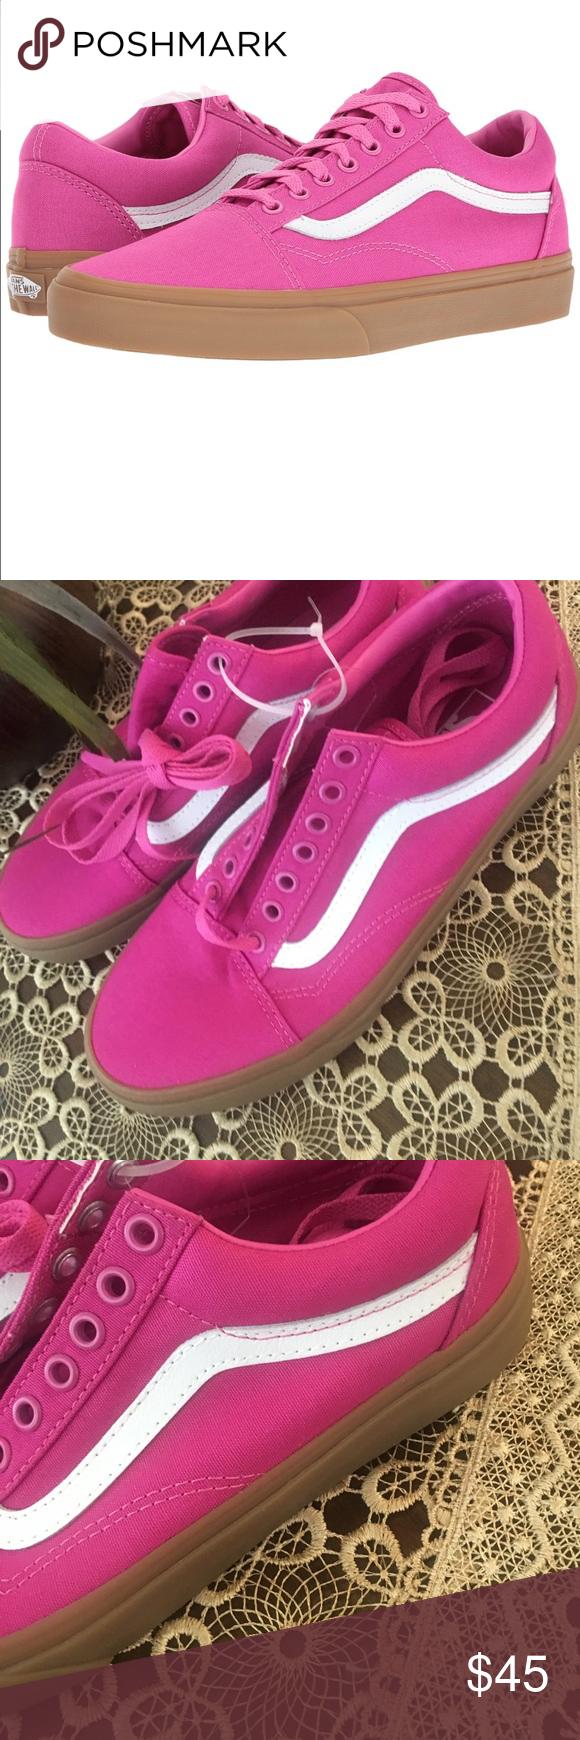 Vans 💞 Brand new spring colors 💞 Vans Shoes